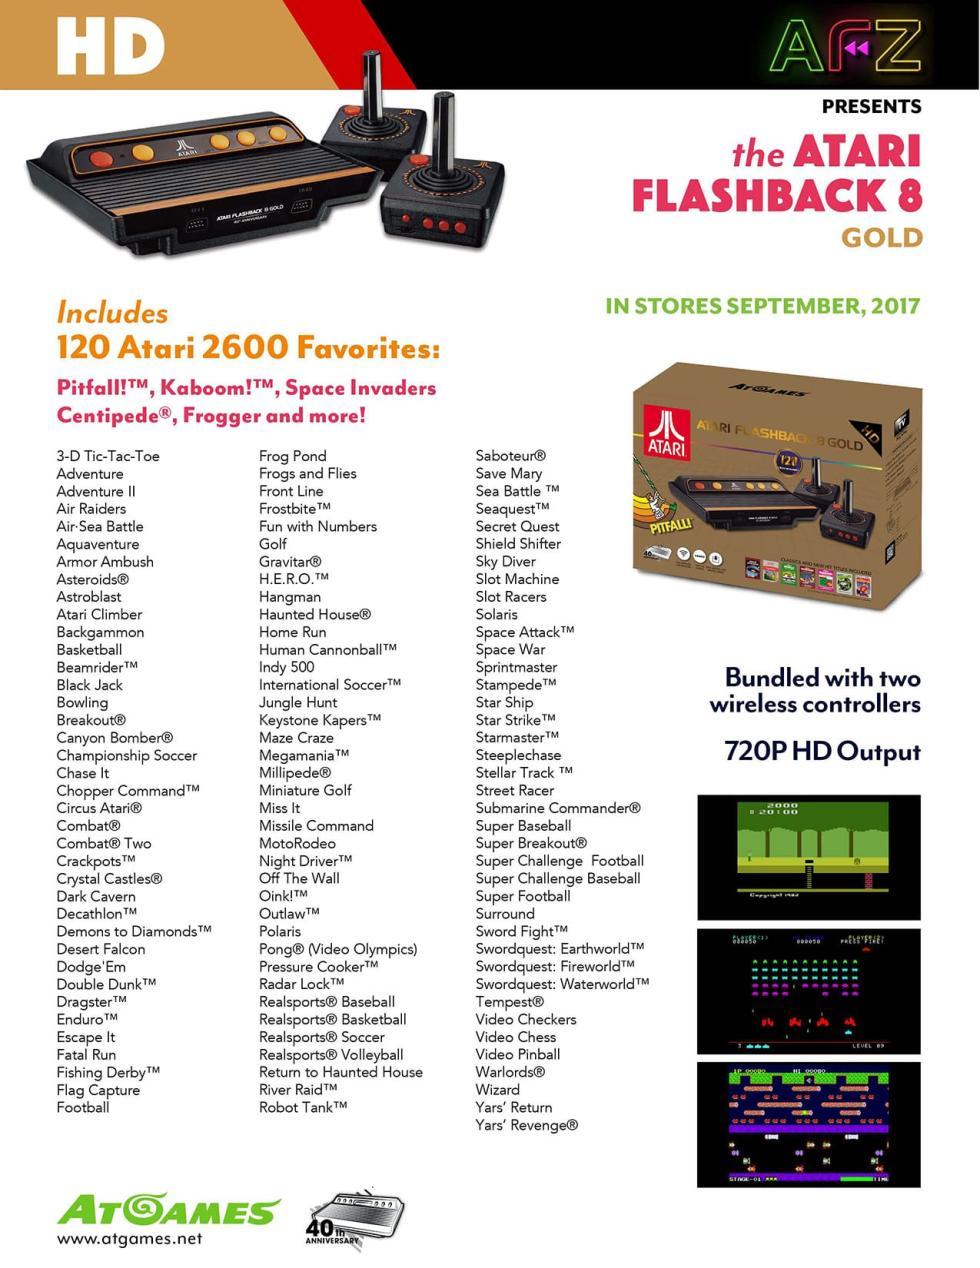 Lista de juegos completa de Atari Flashback 8 Gold, la consola retro de AtGames